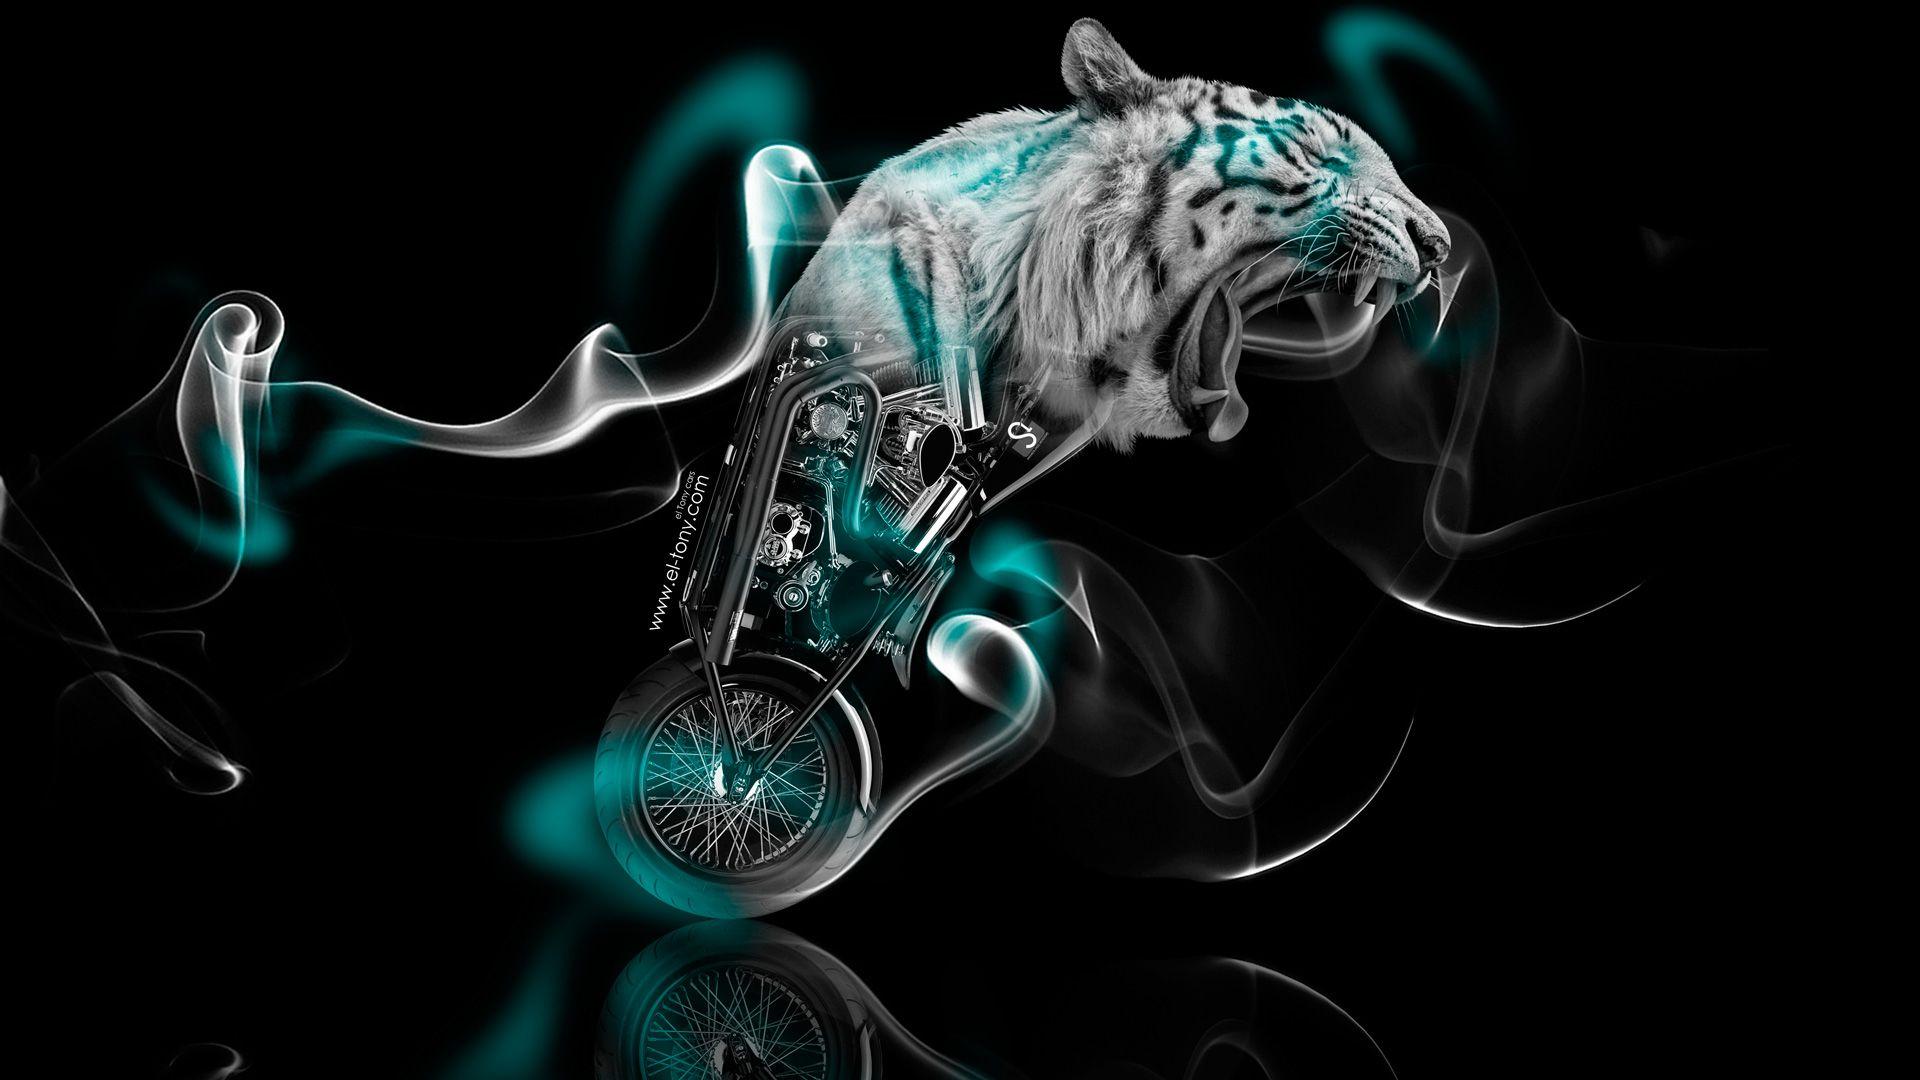 Pin by Candice Chisholm on Smoke & Powder | Animal wallpaper, Hd  backgrounds, Pet birds